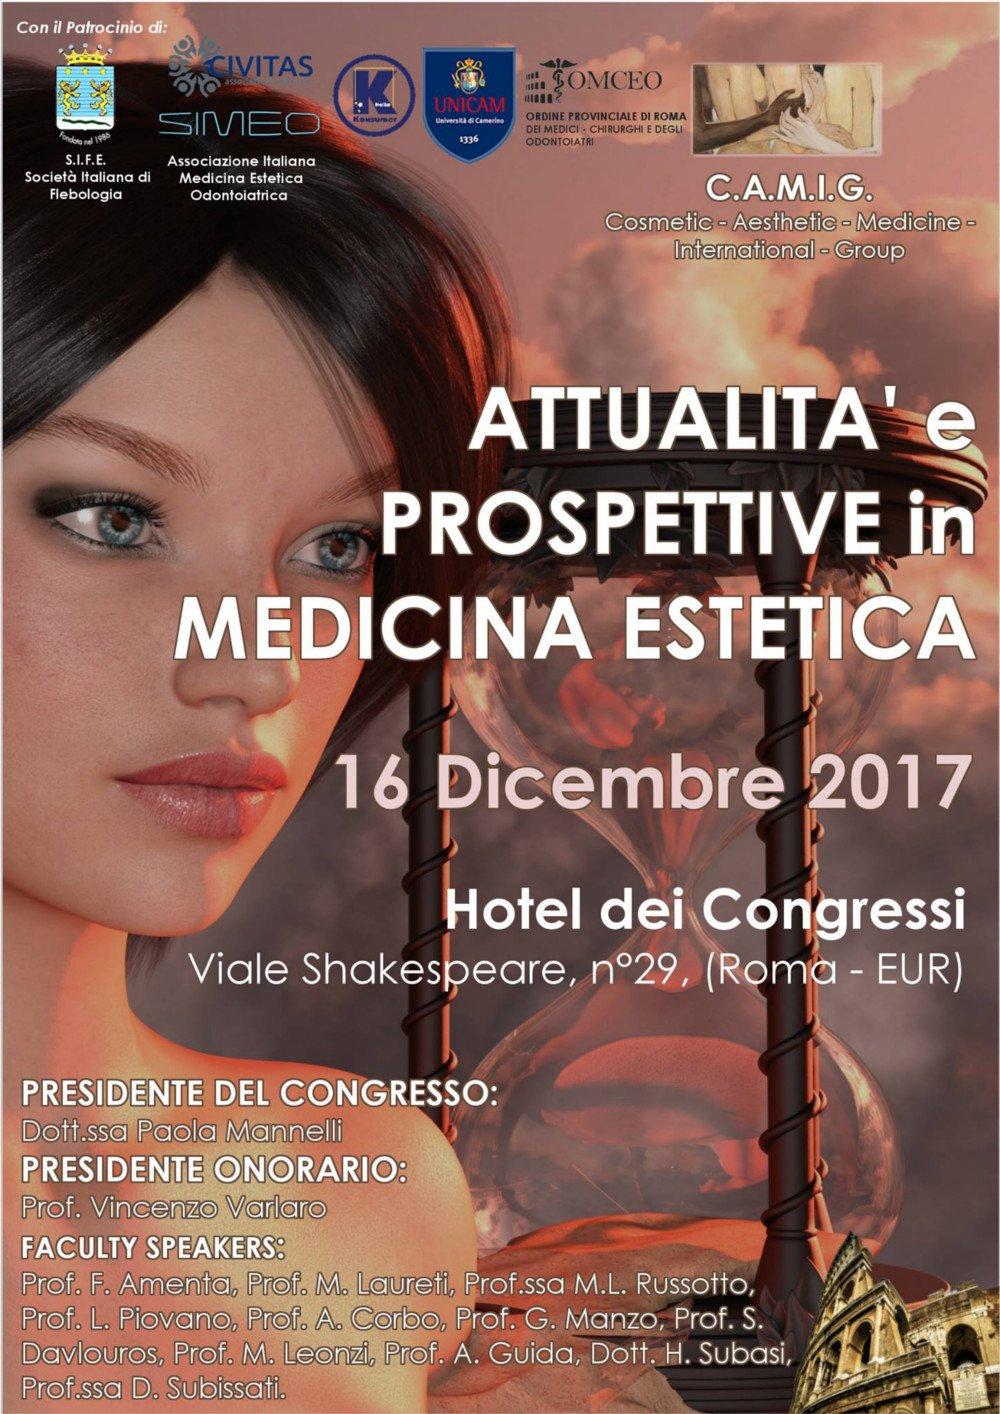 Cosmetic Aesthetic Medicine International Group | 16.12.17 | 1